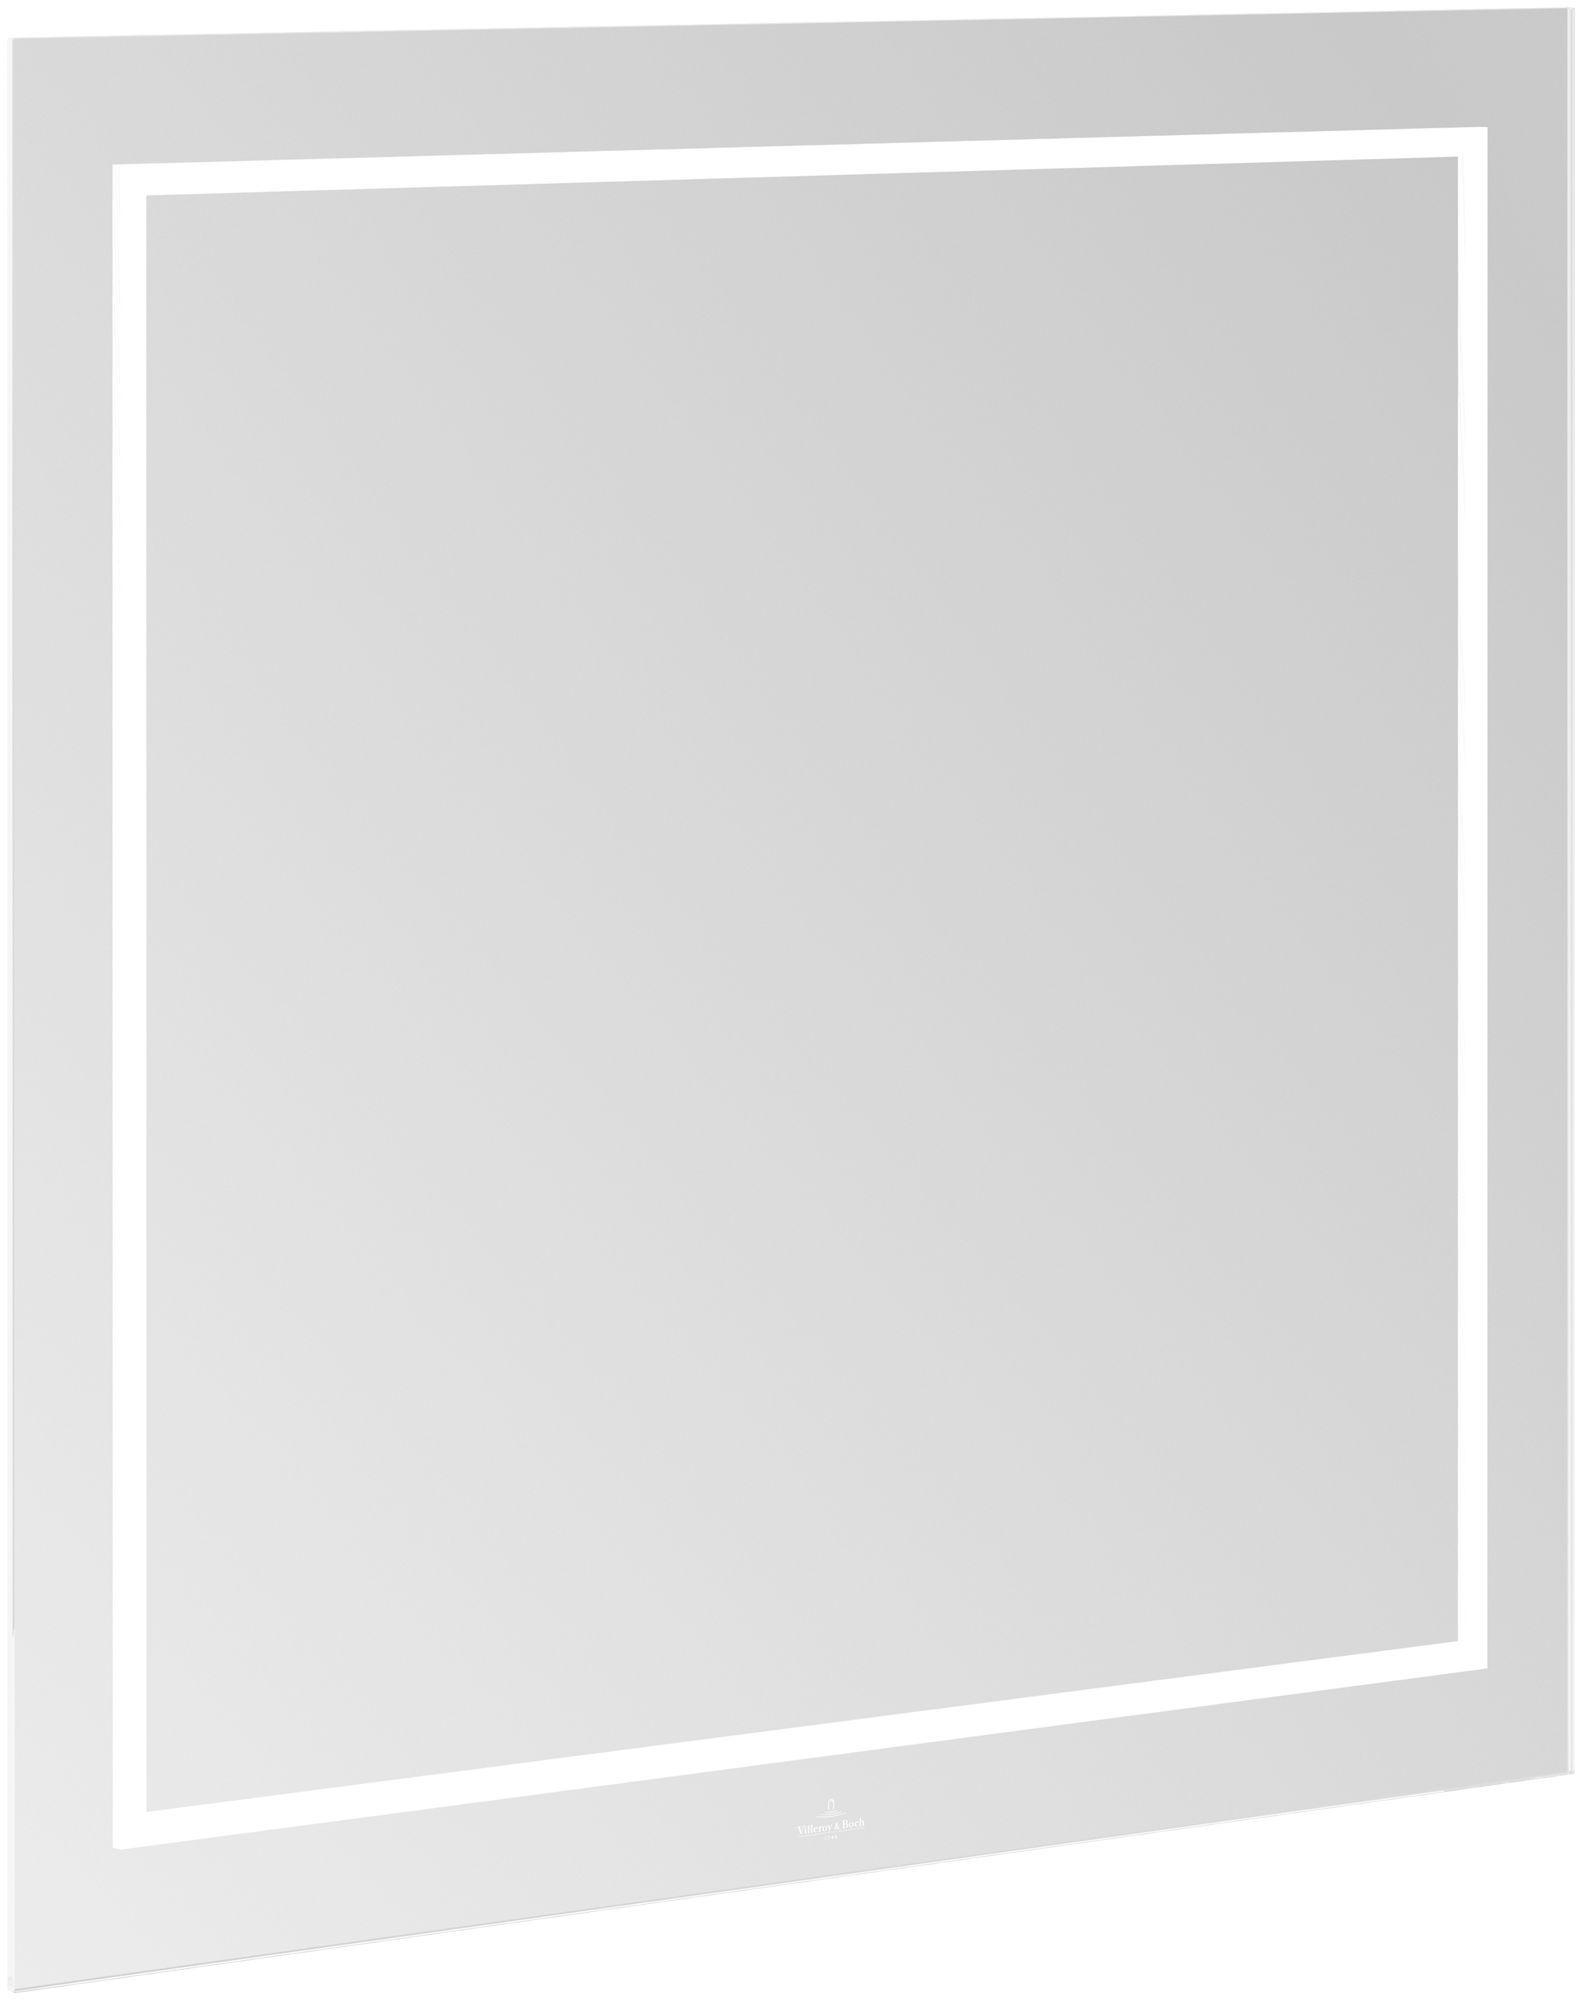 Villeroy & Boch Finion G600 Spiegel LED-Beleuchtung B:80xH:75xT:4,5cm G6008000